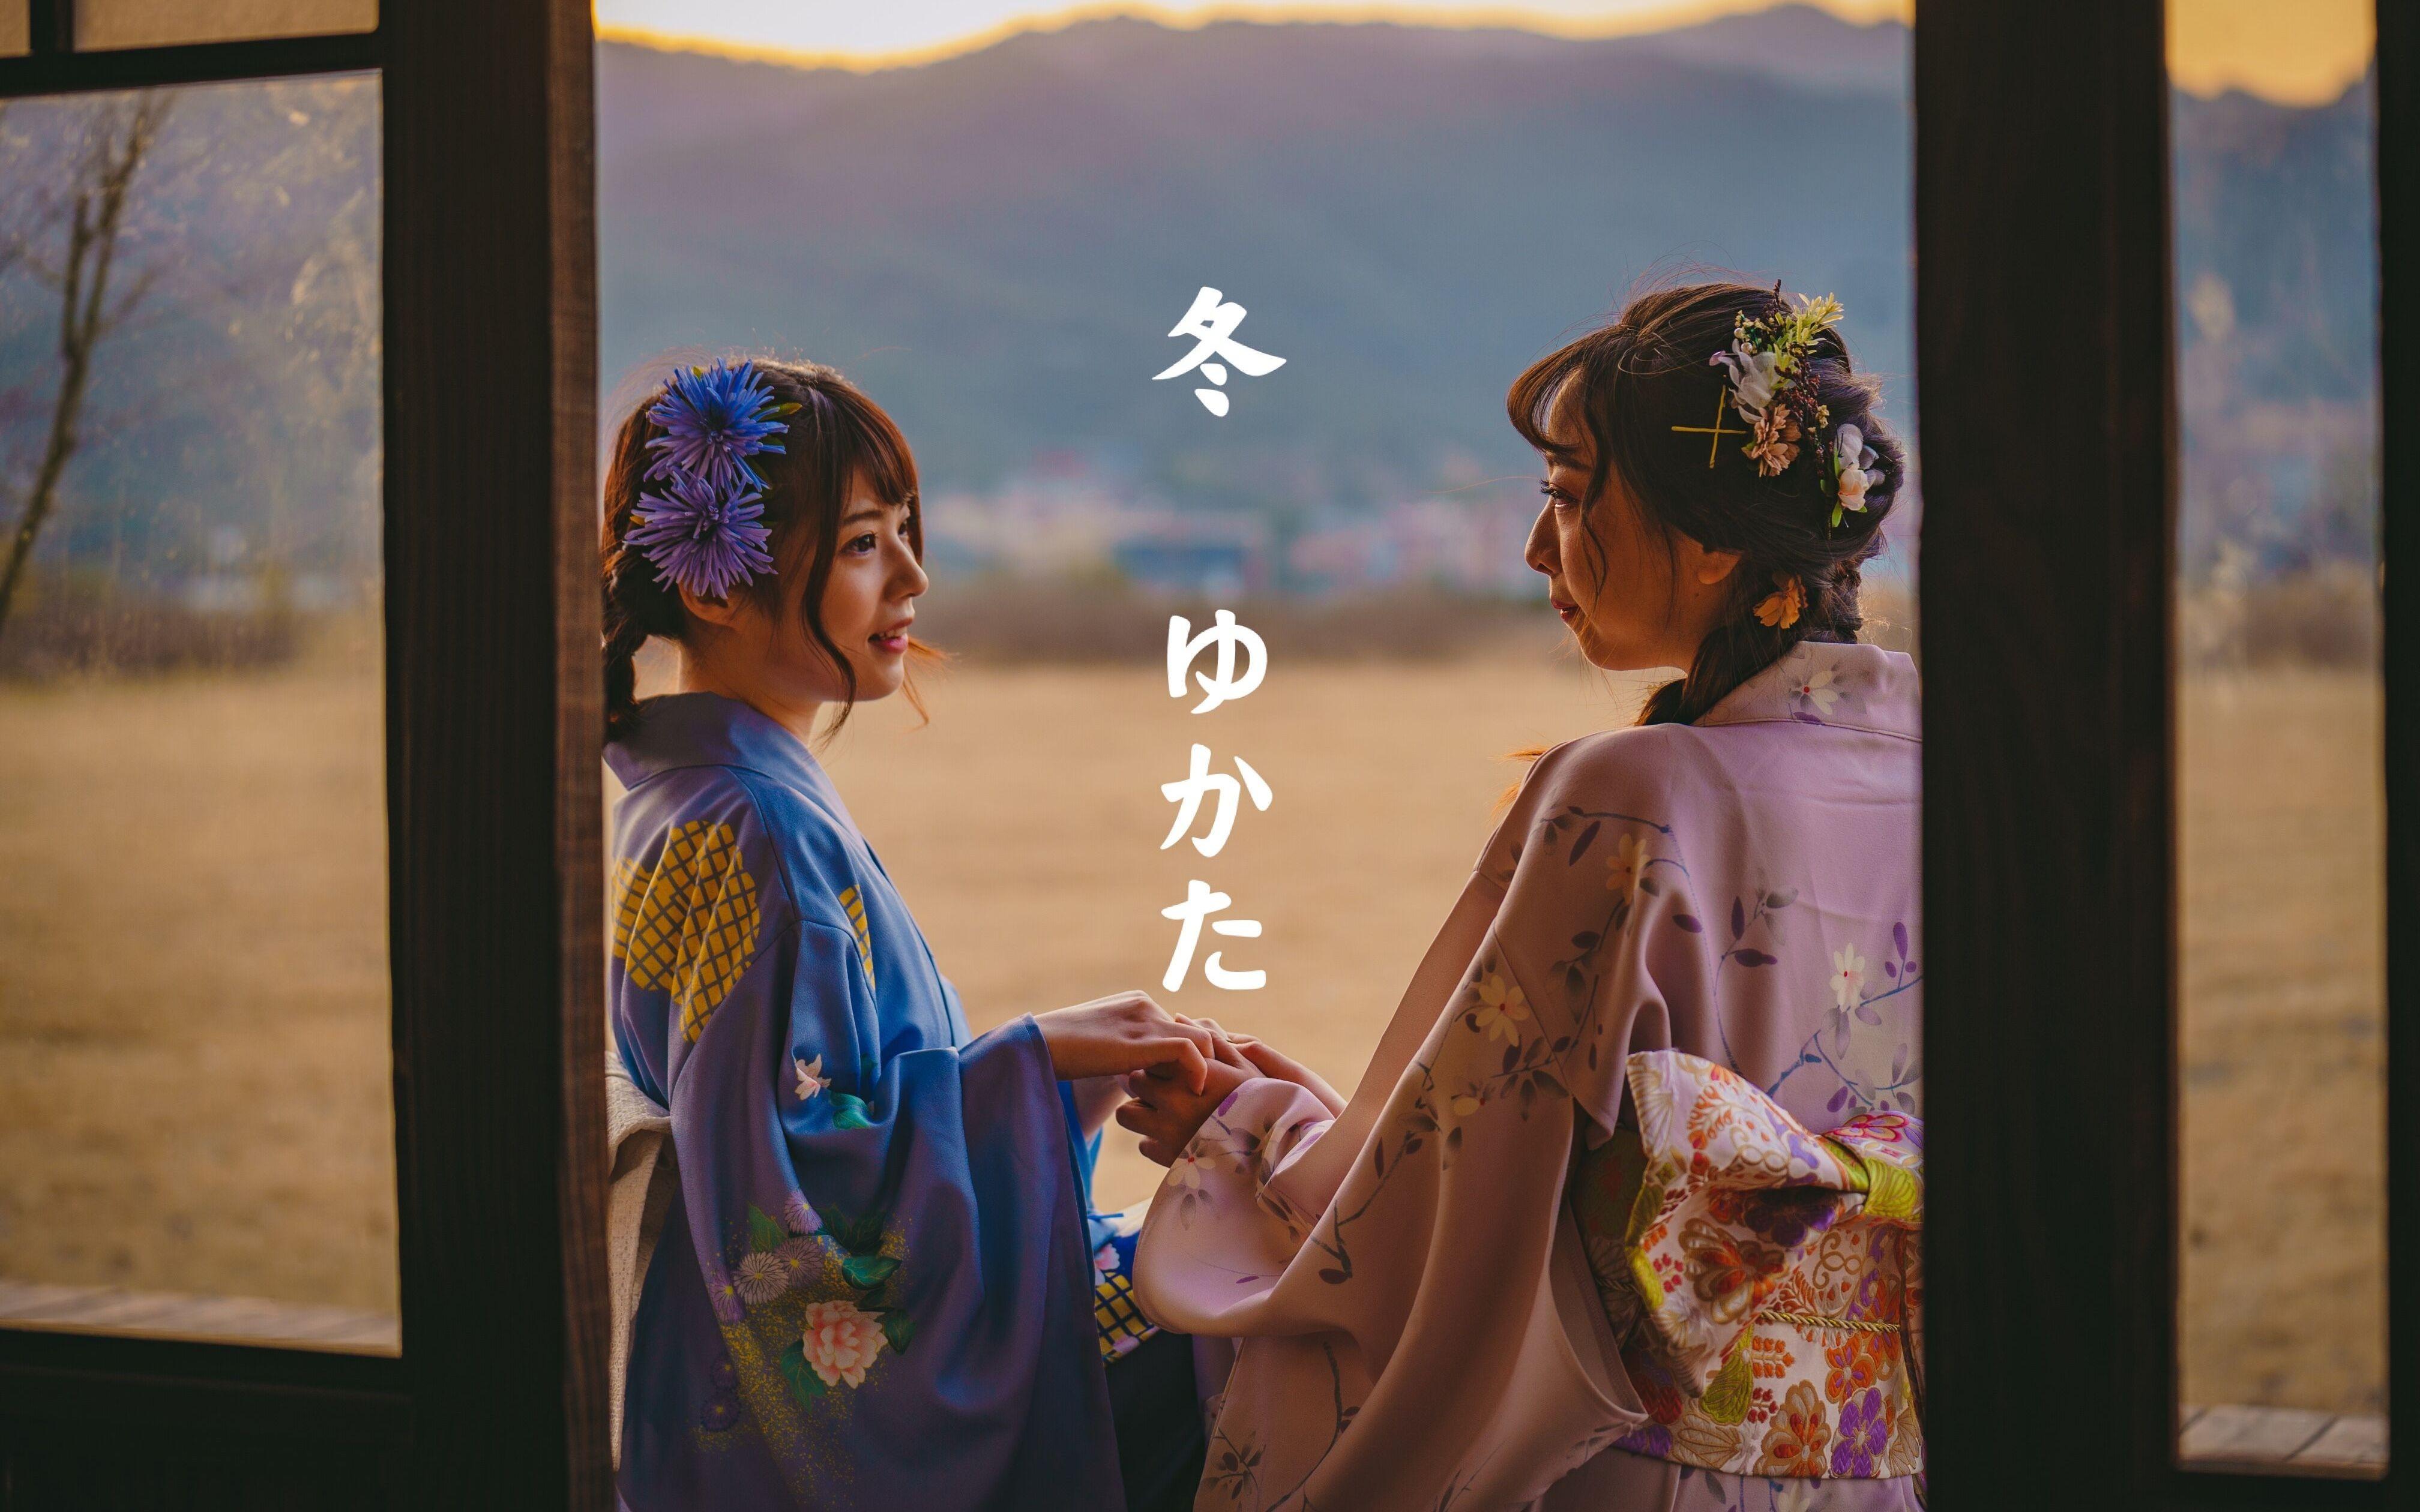 【guchan香菇】冬の姊妹花   浴衣 烟花 冬日   小镰仓❤